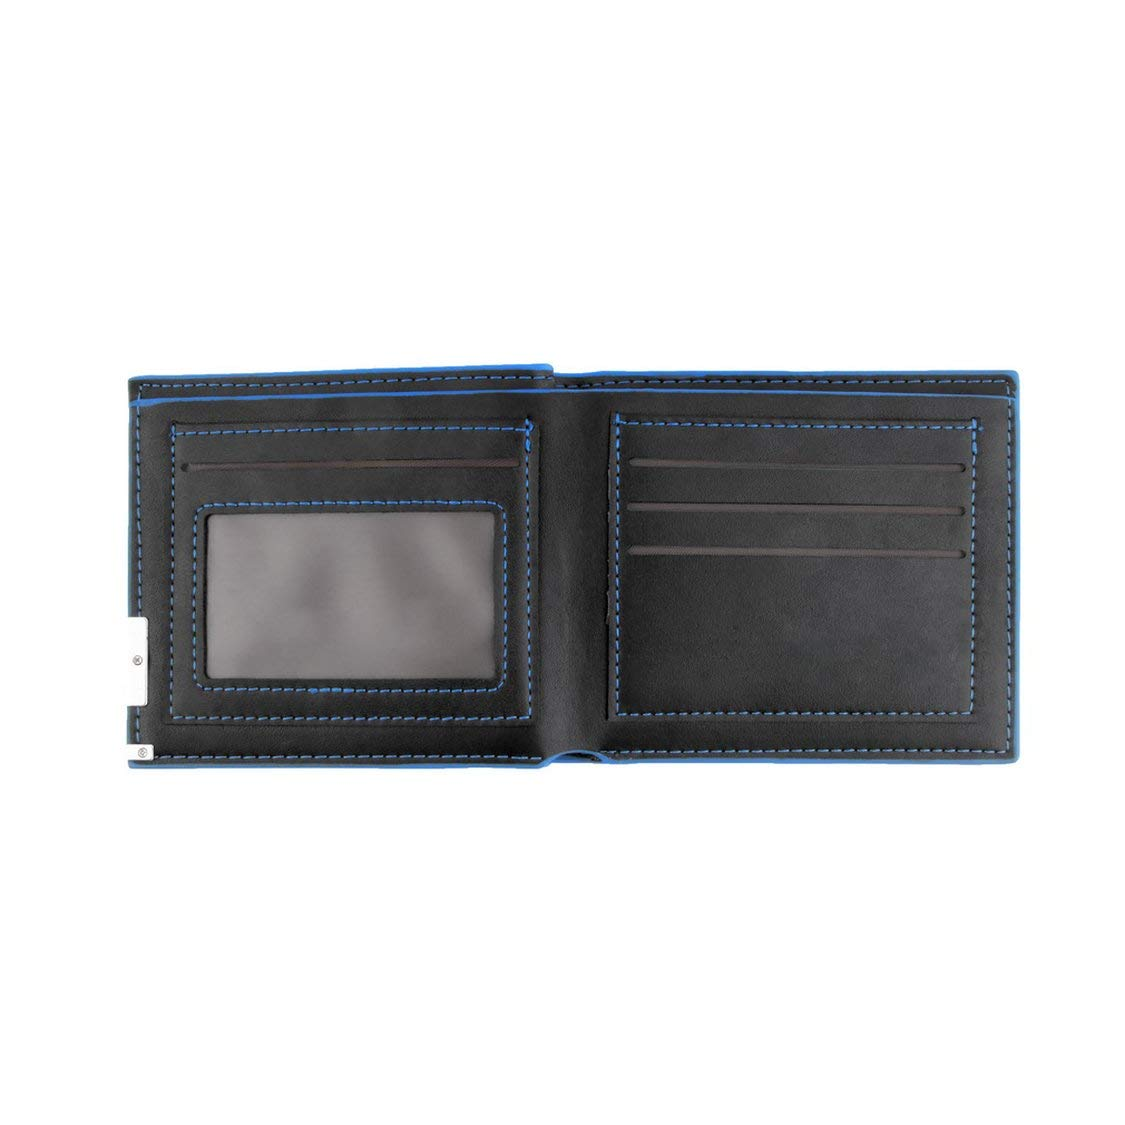 Fashionable Design Male Men Cool Leather Wallet Black Card Clutch Purse Bifold Money Clip Short Type Money Wallet